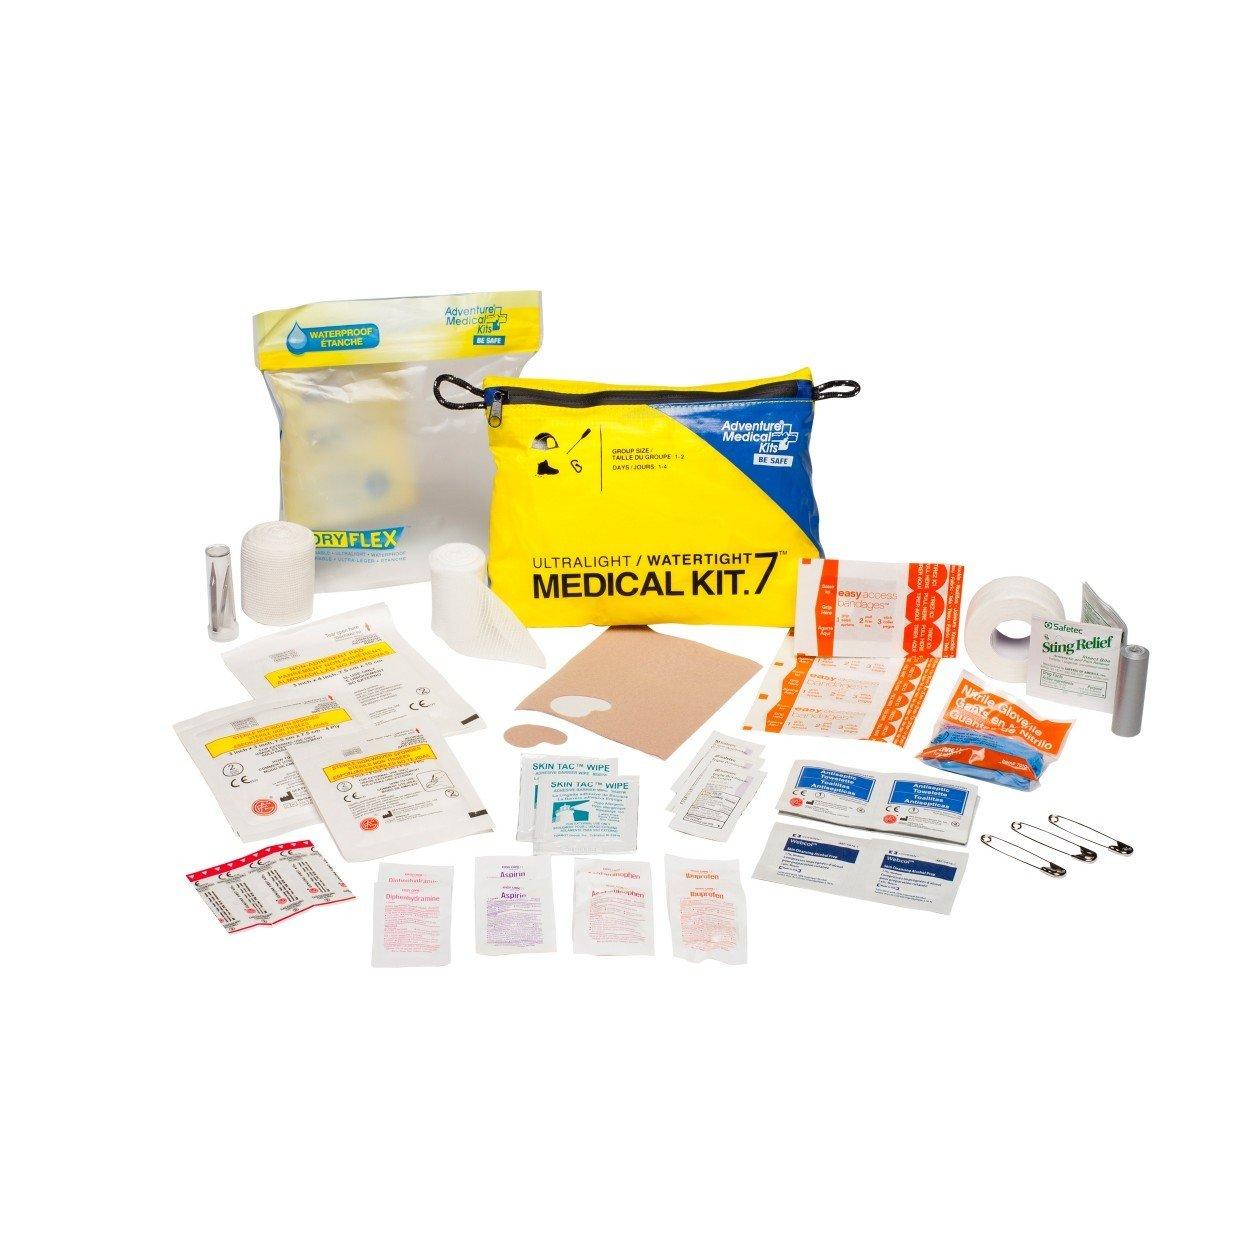 Adventure Medical Kit Ultralight & Watertight .7